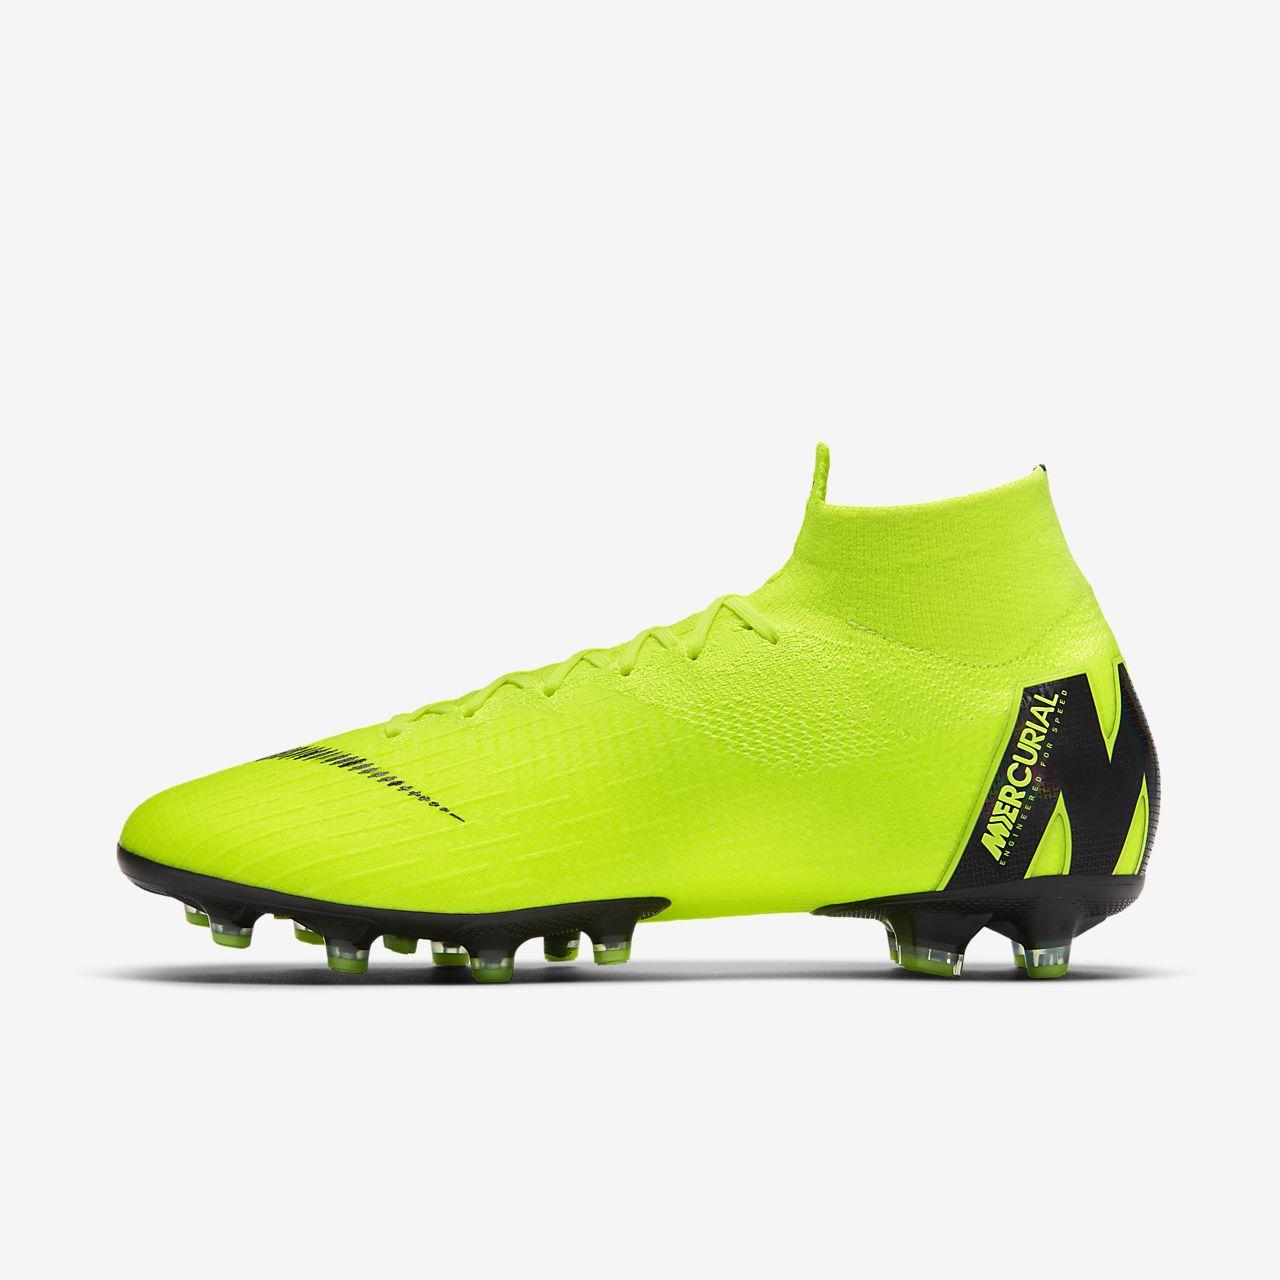 huge selection of 698fb 21876 ... Calzado de fútbol para césped artificial Nike Mercurial Superfly 360  Elite AG-PRO hot sale ...